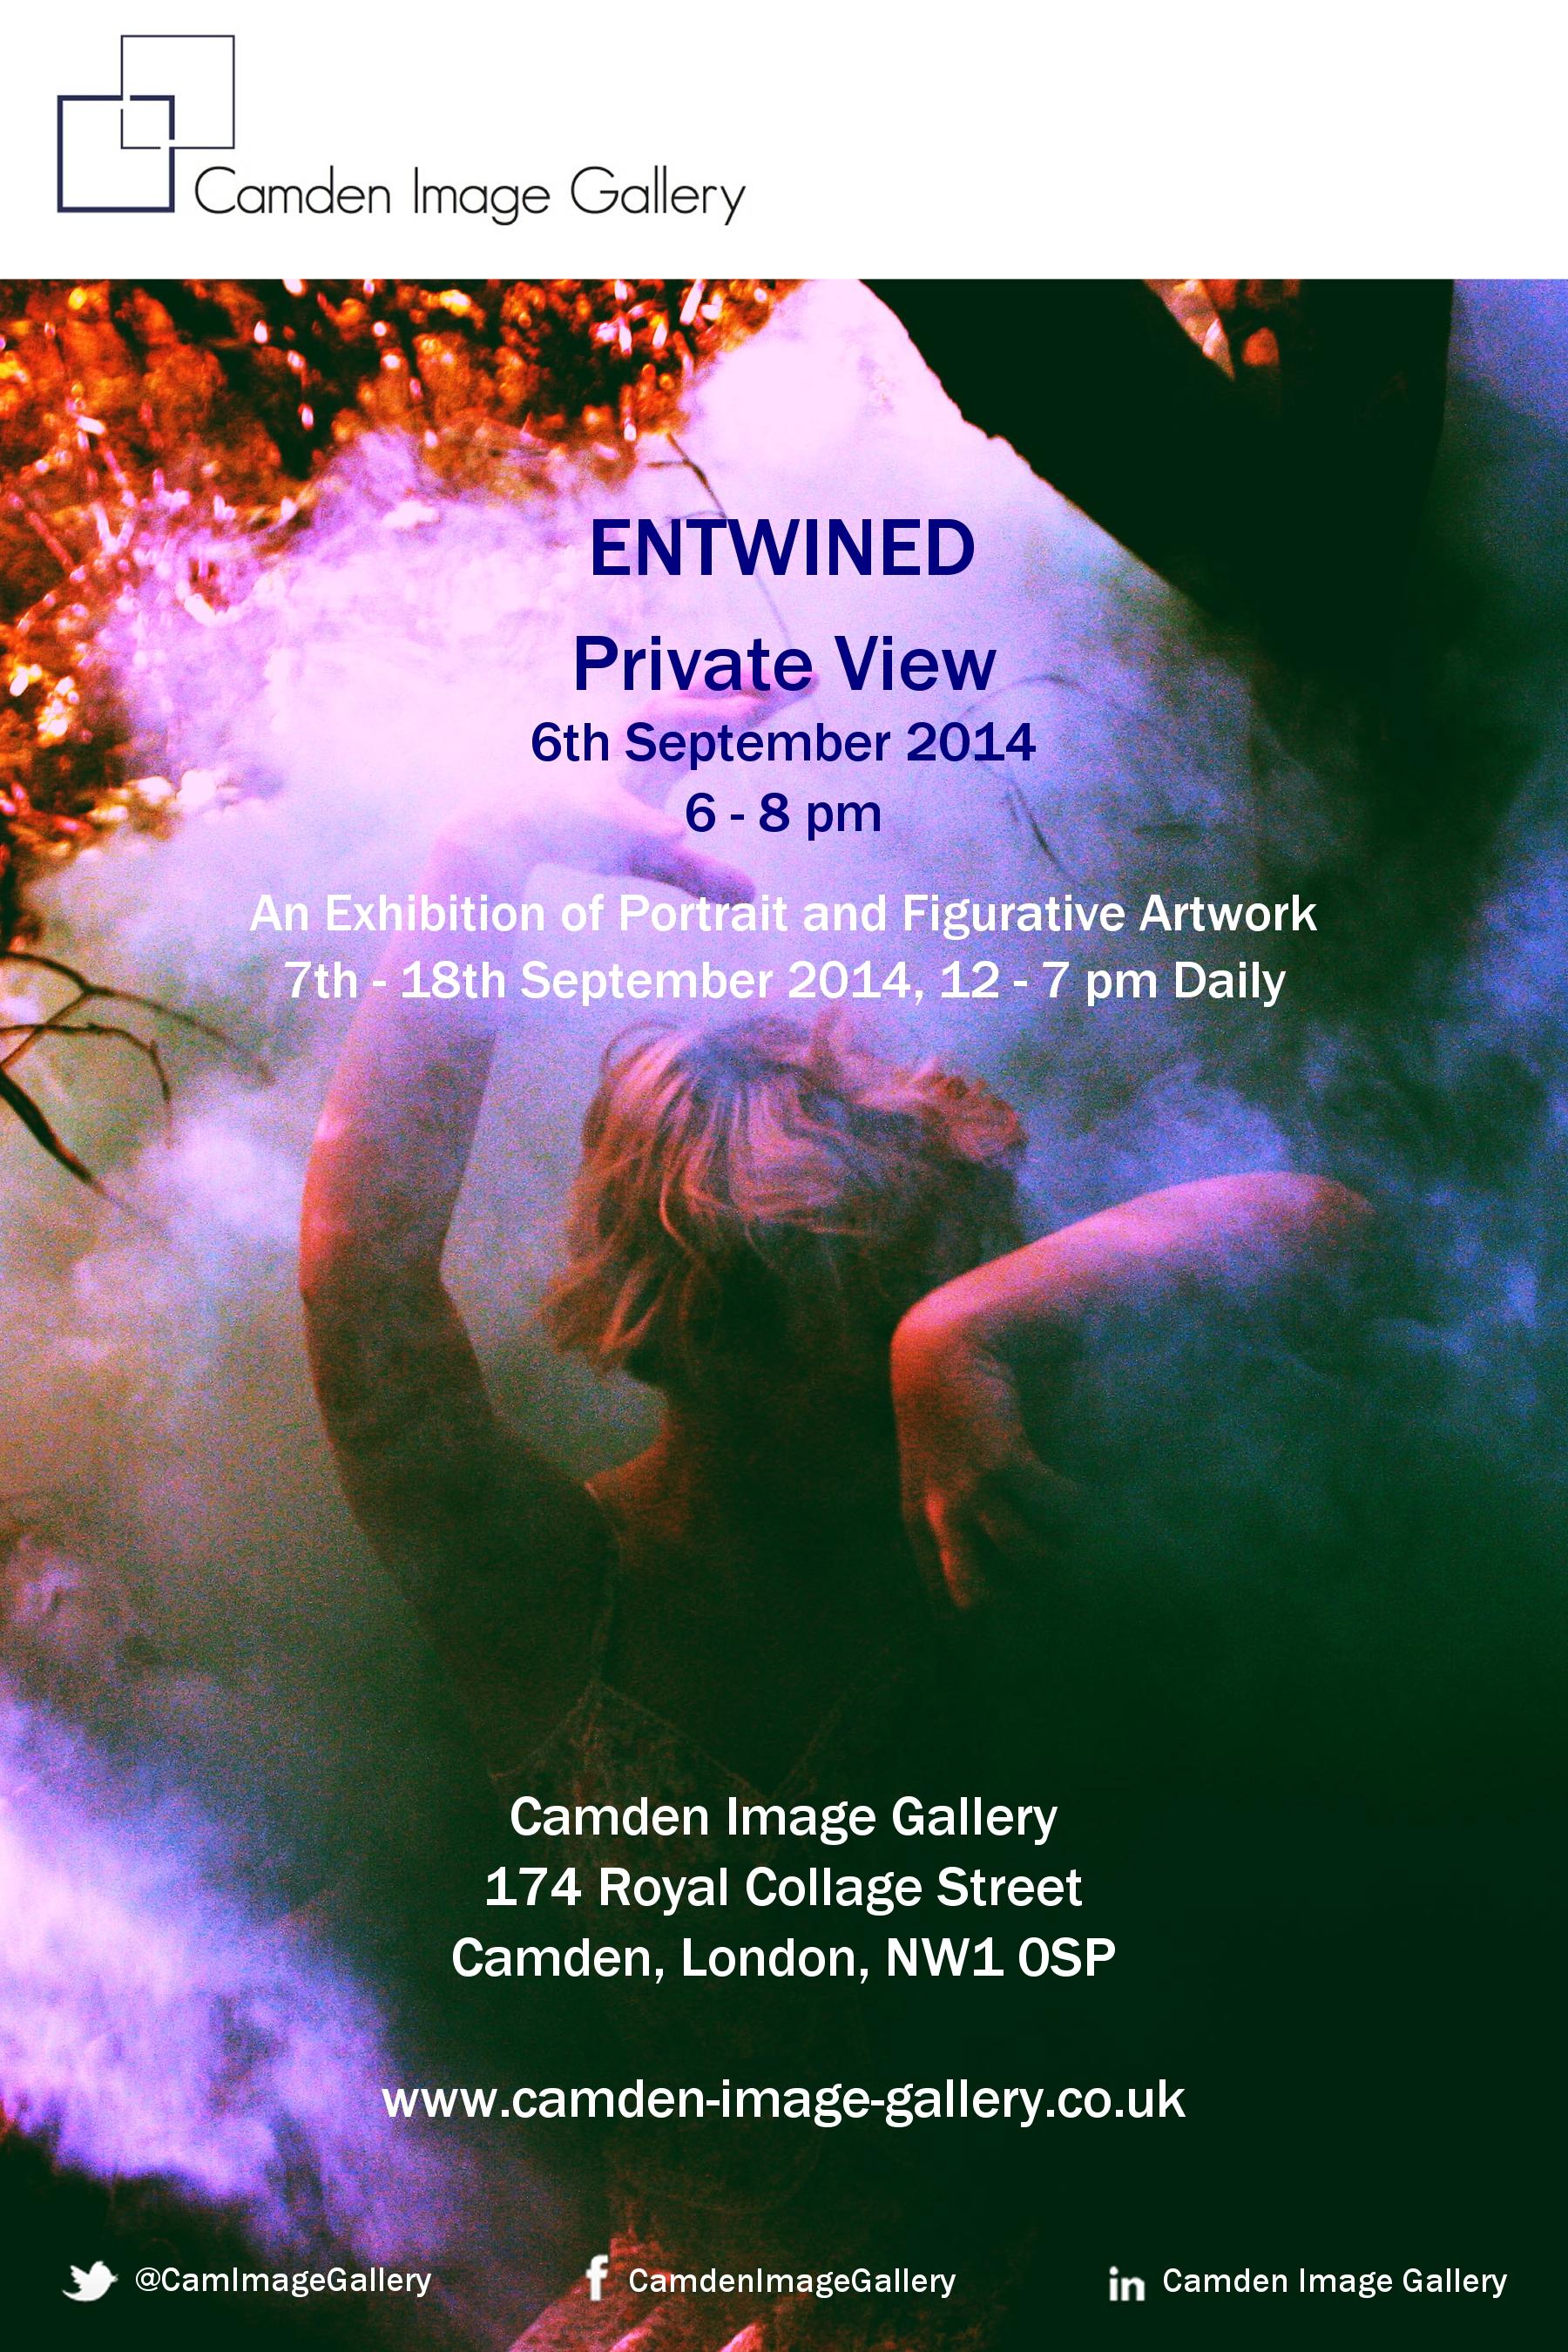 Karl Dmitri Bishop - Camden Image Gallery 2014